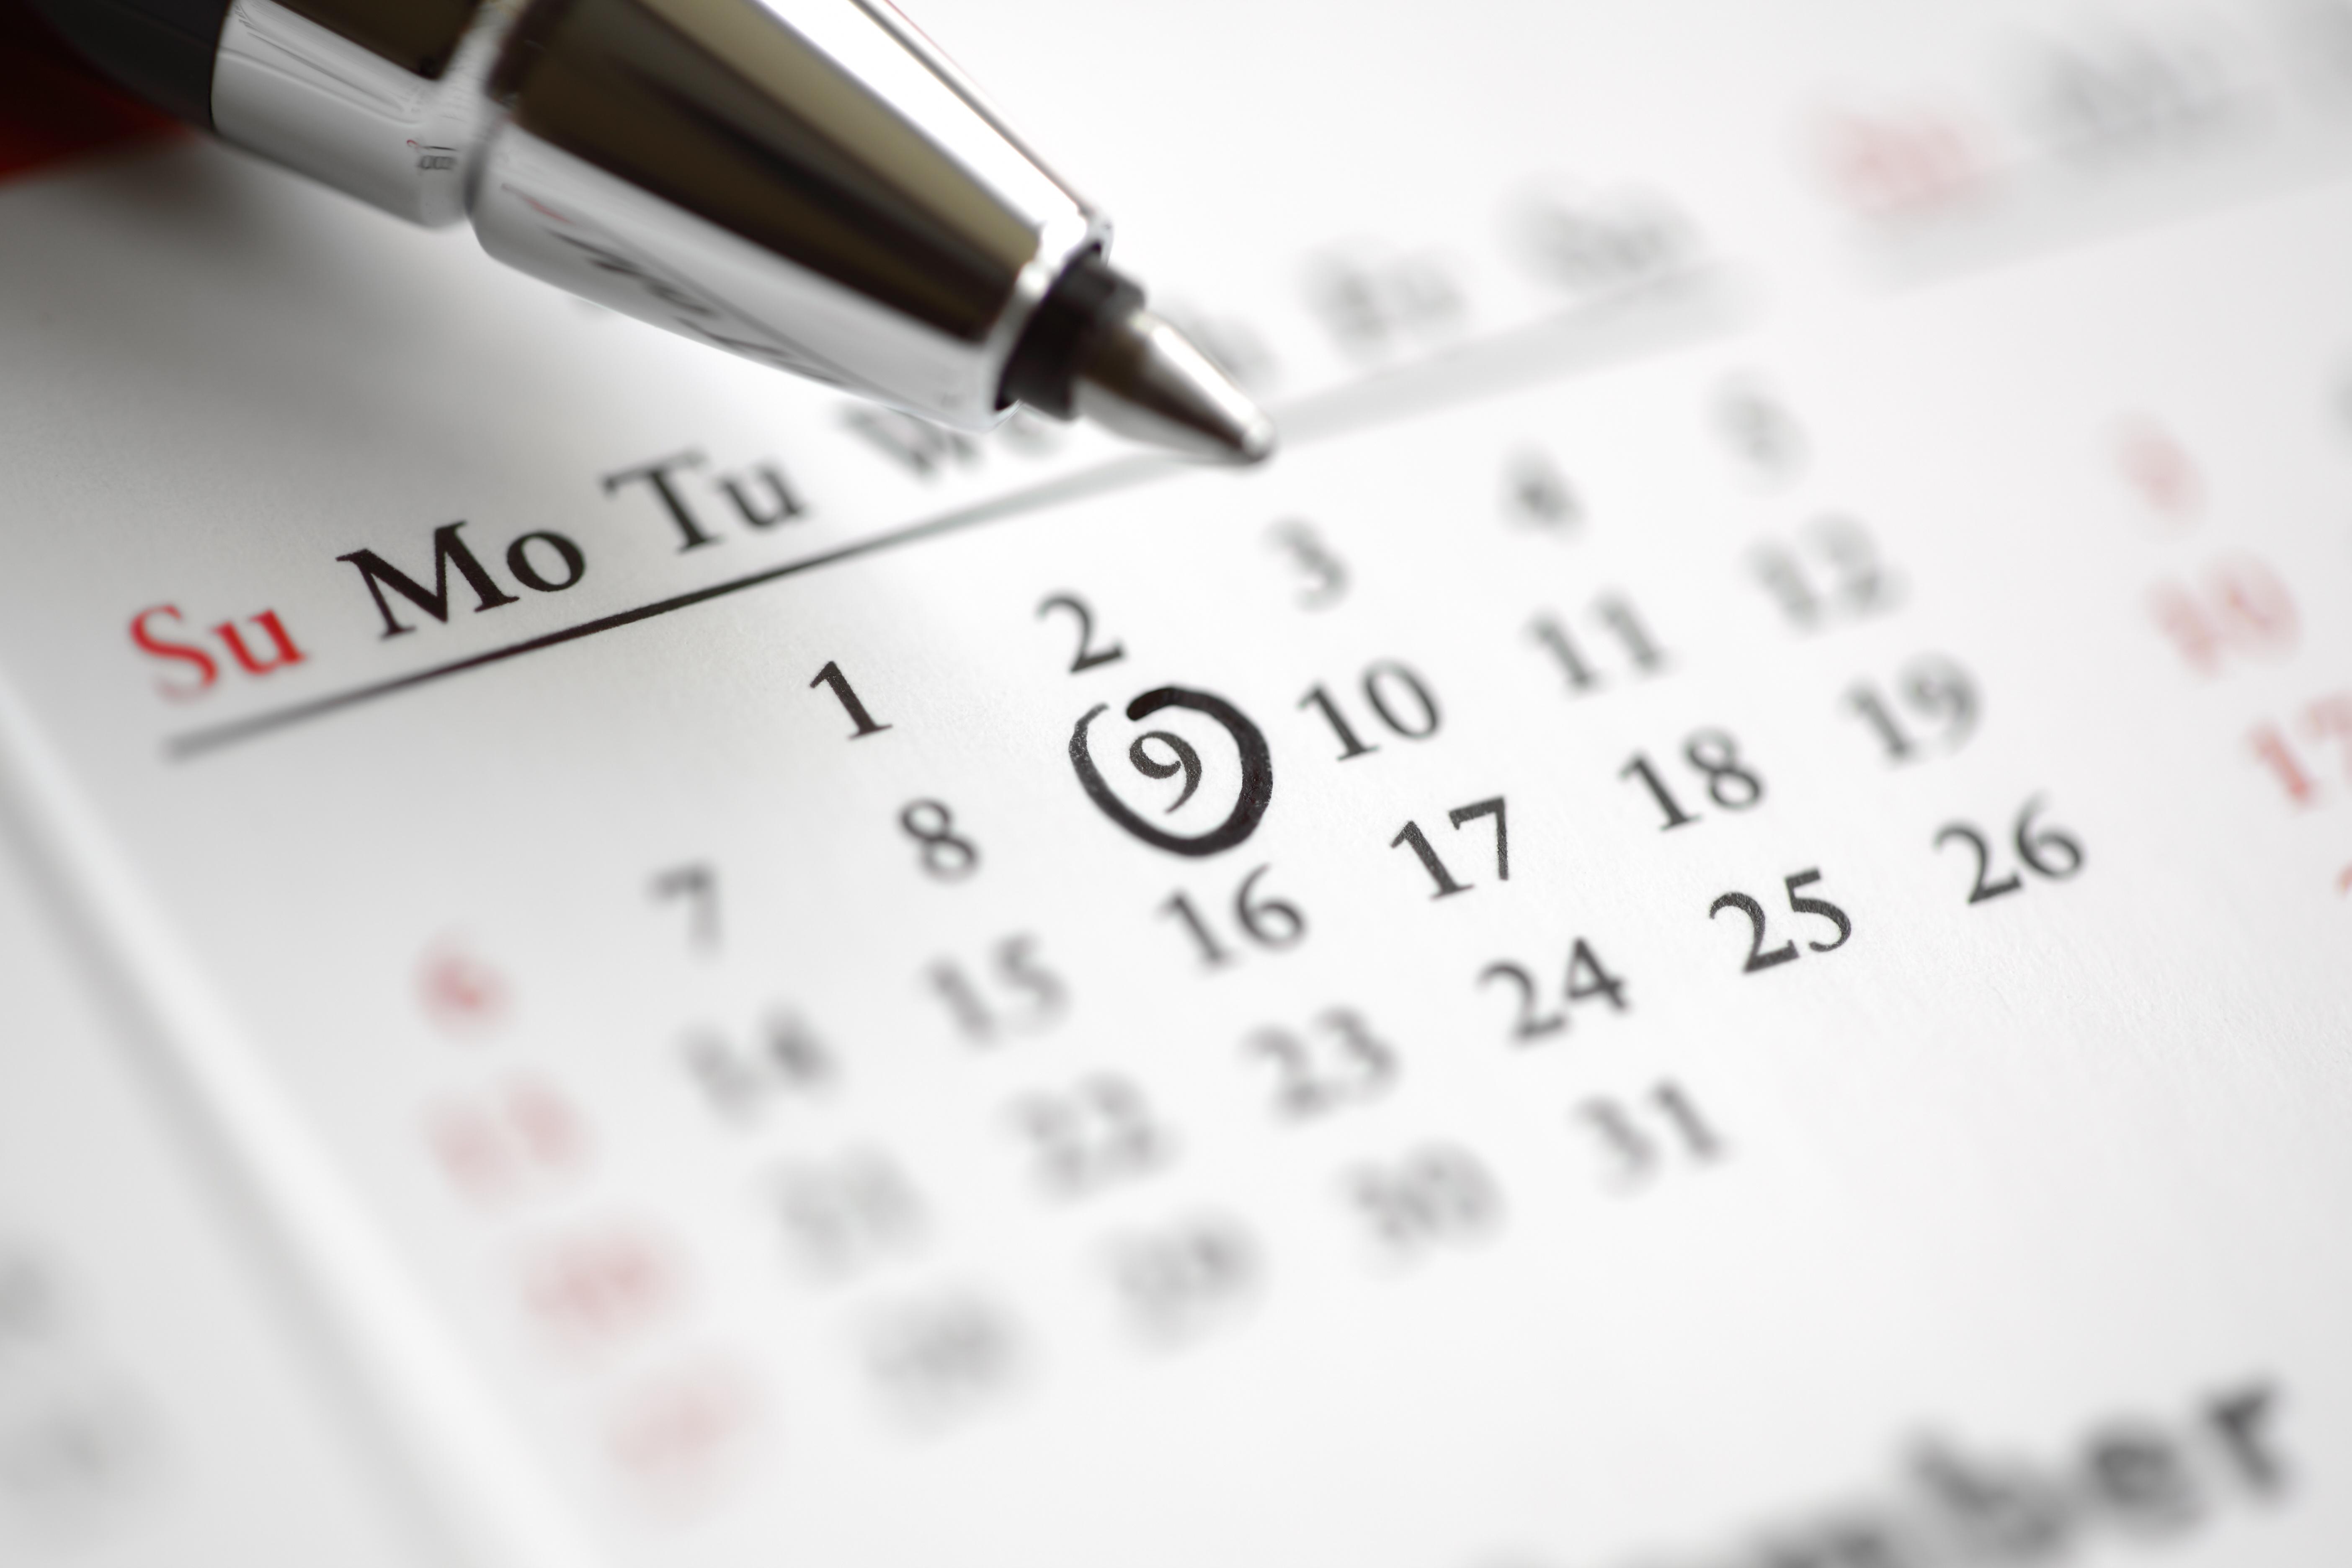 Calendar 9 Circled.jpg